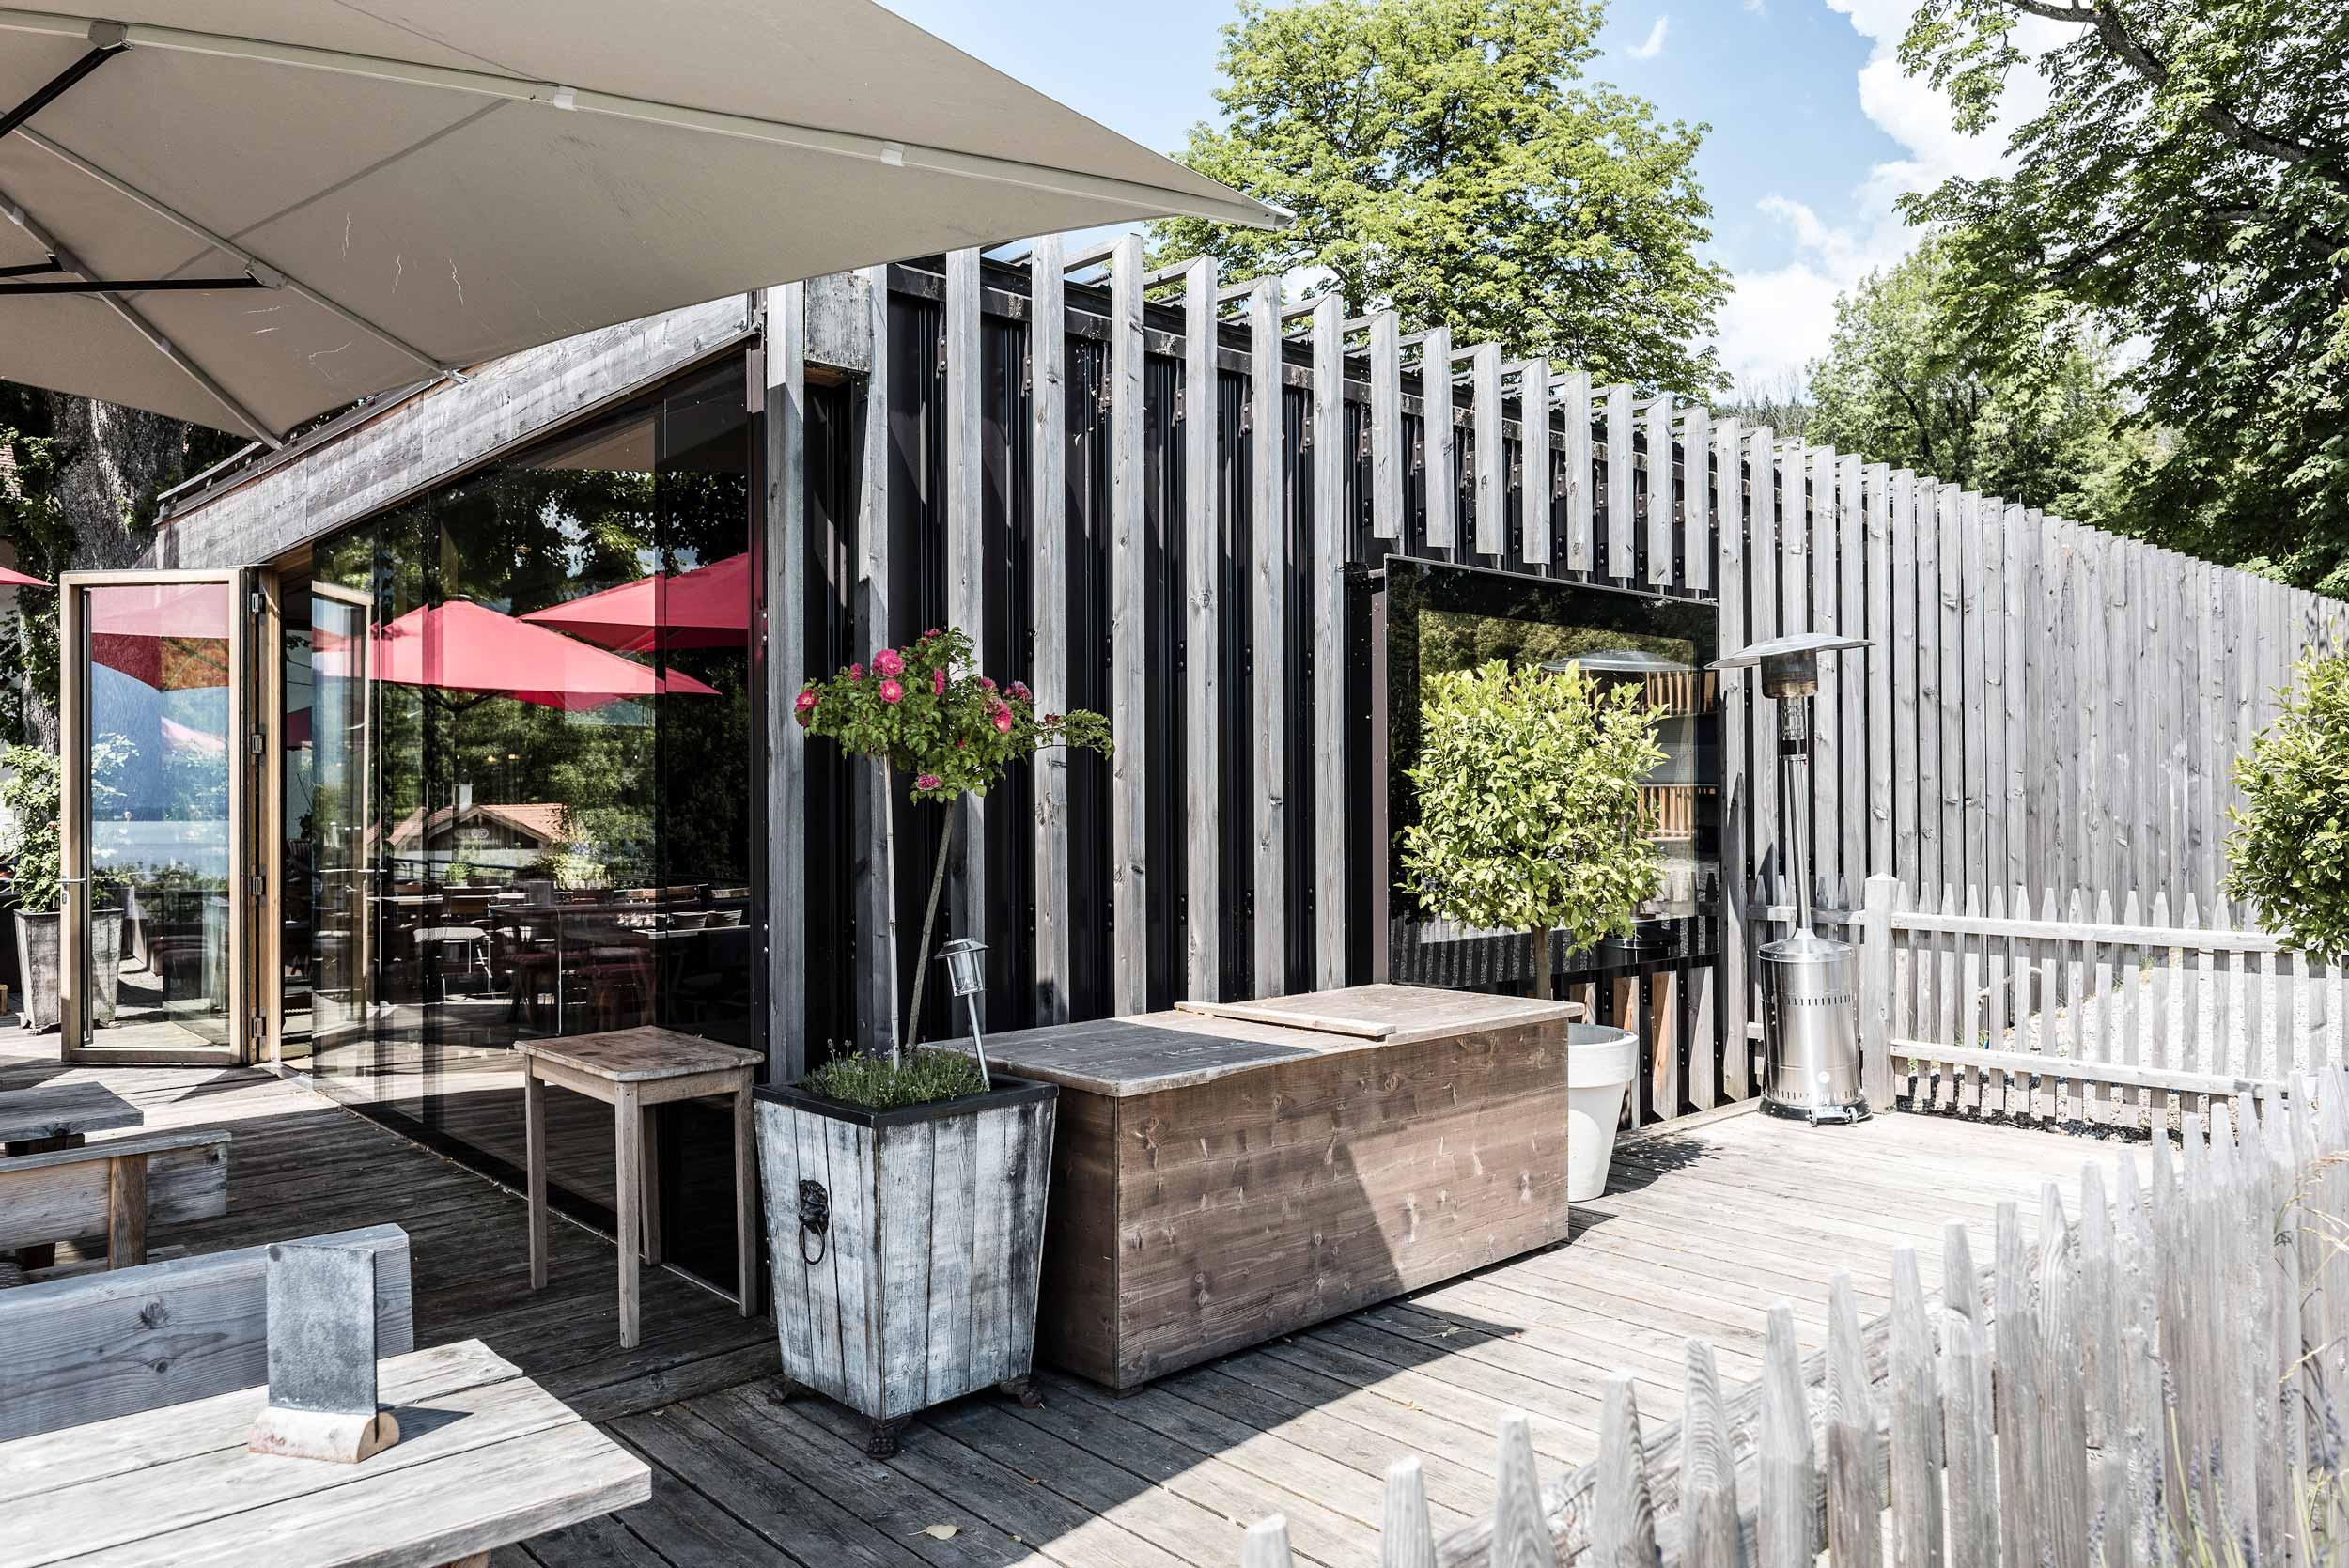 zimmerei-stoib-holzbau-holzhaus-gut-kaltenbrunn-tegernsee-festsaal-restaurant-fassade-sanierung-käfer-biergarten-terrasse-13.jpg